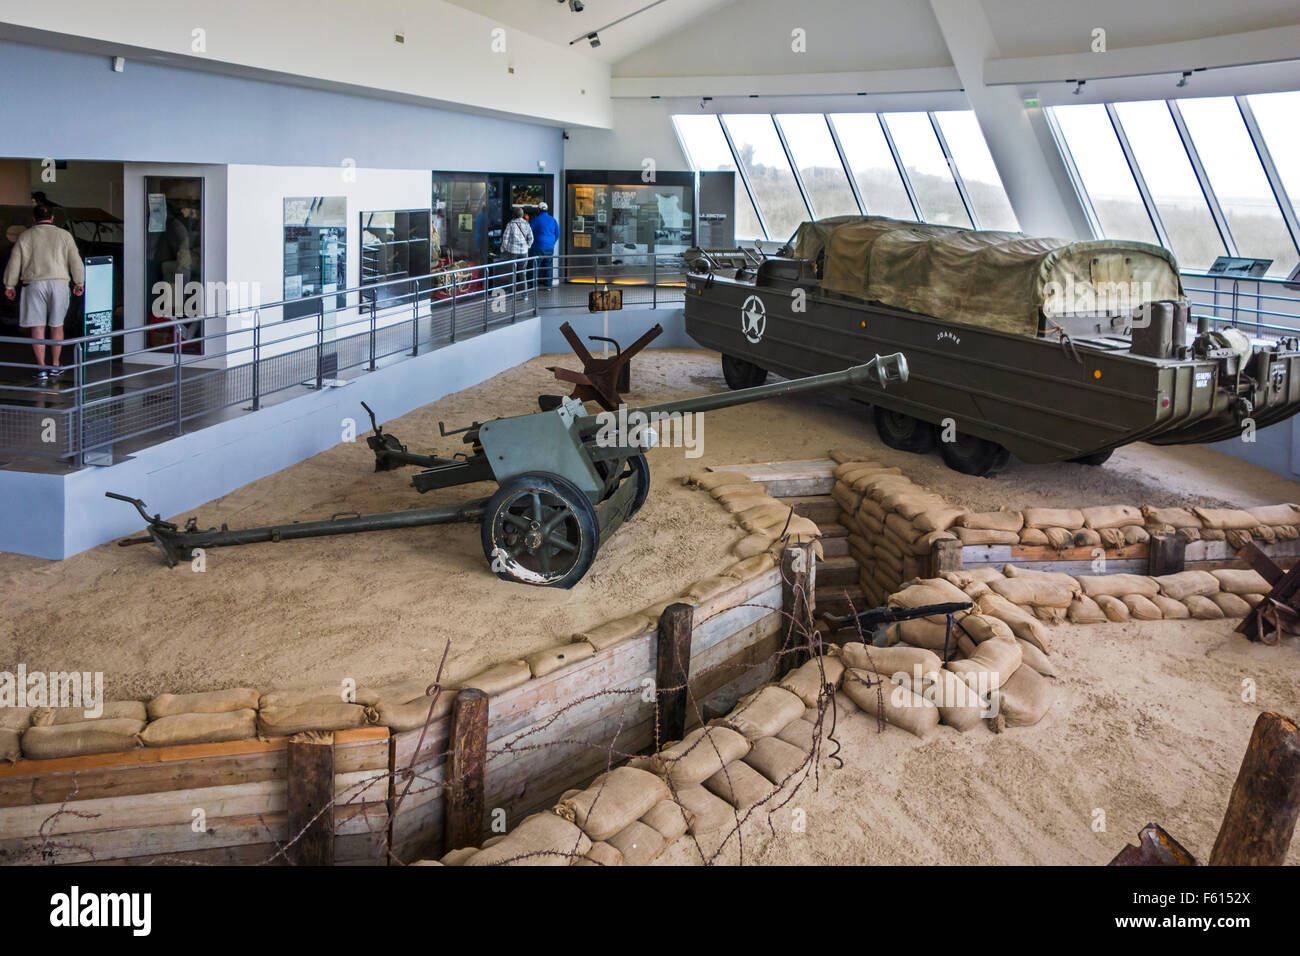 German 50 Mm Anti Tank Gun: German Pak 40 75 Mm Anti-tank Gun And DUKW, Six-wheel